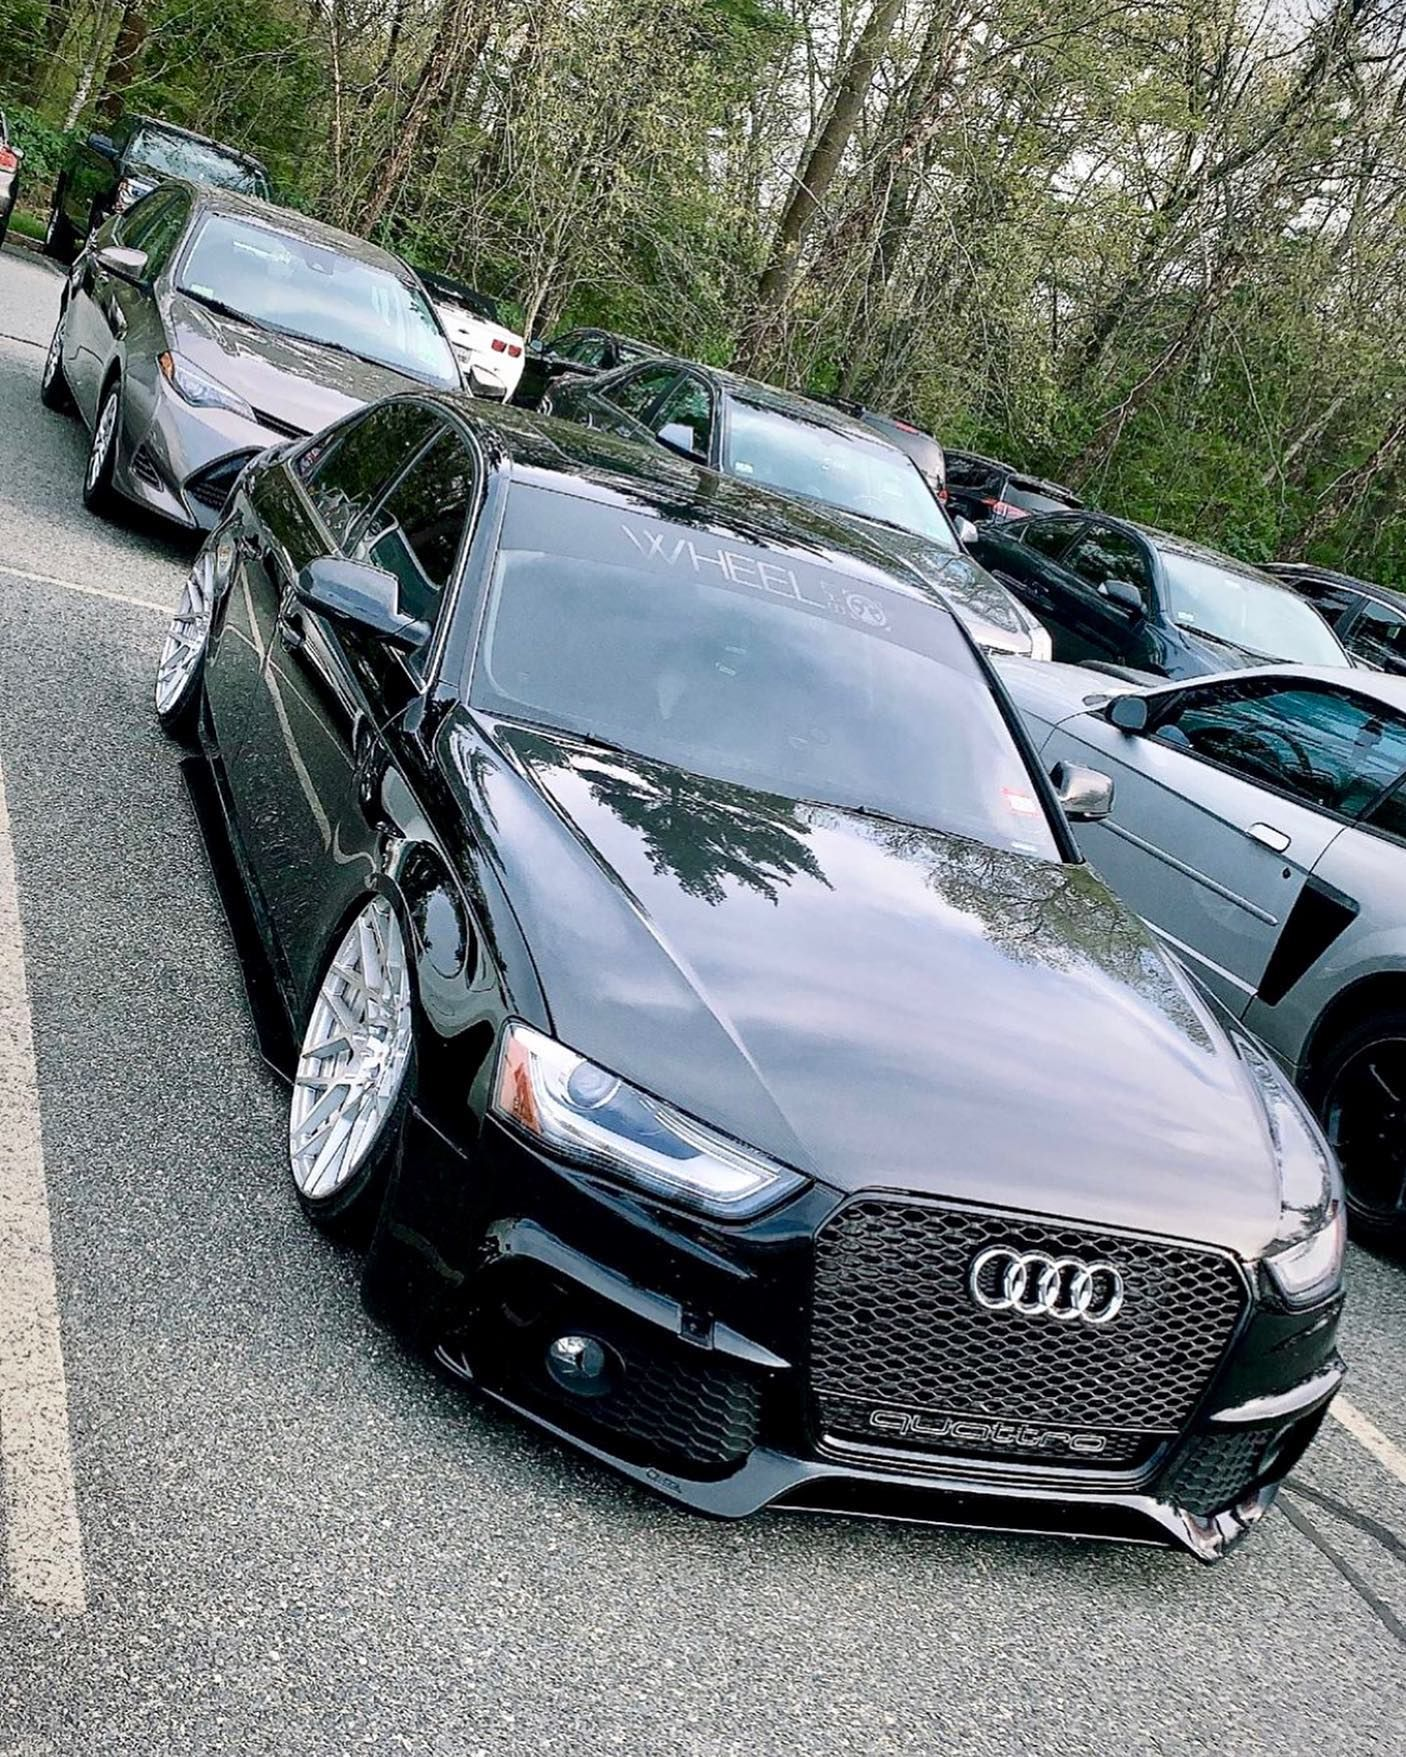 Caractere Front Bumper With Foglights Fits Audi A4 B8 5 Audi A4 Audi Audi Dealership